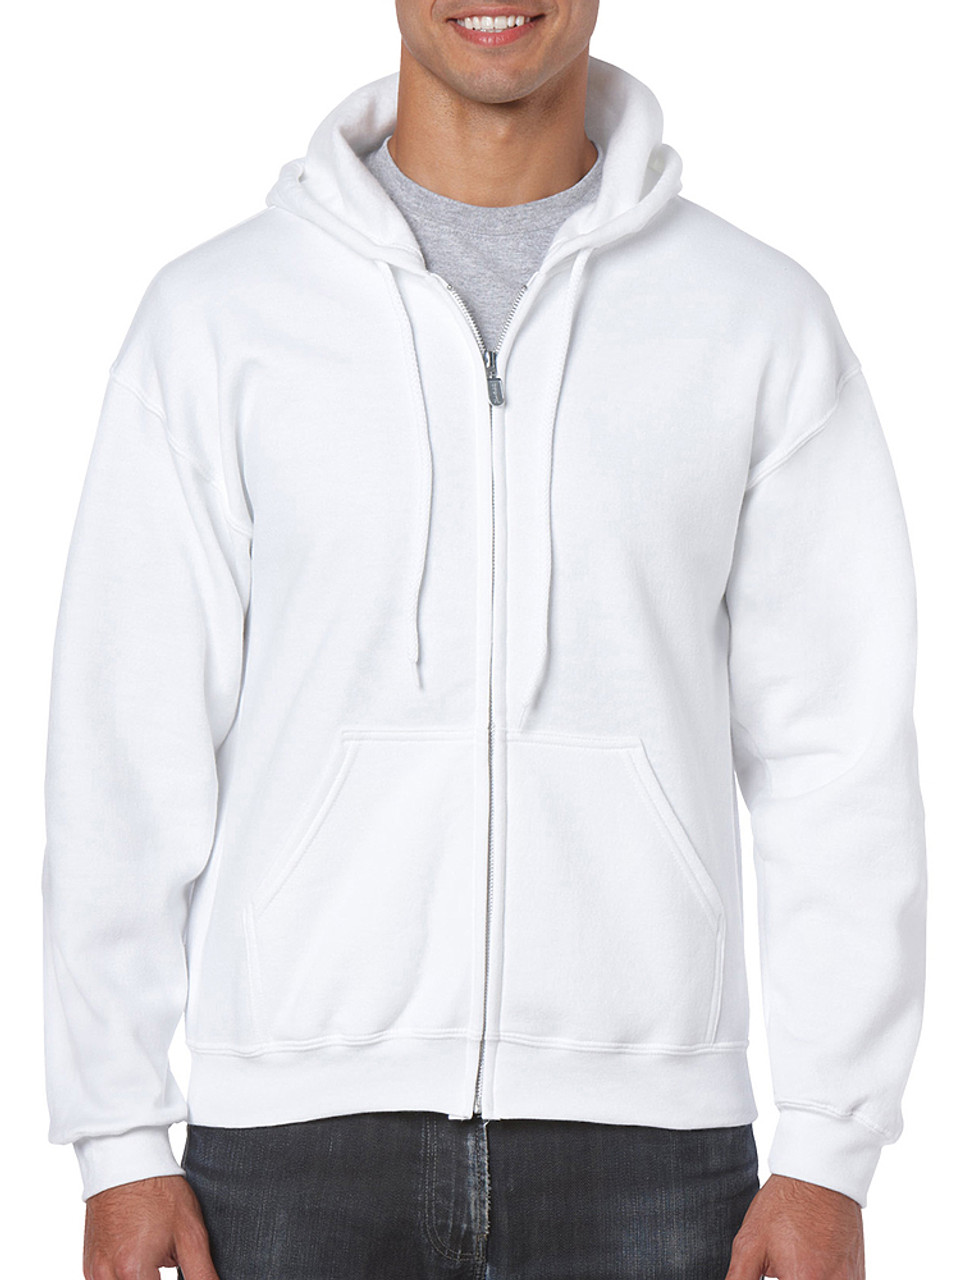 18600 Gildan 50/50 Full Zip Hooded Sweatshirt | T-shirt.ca